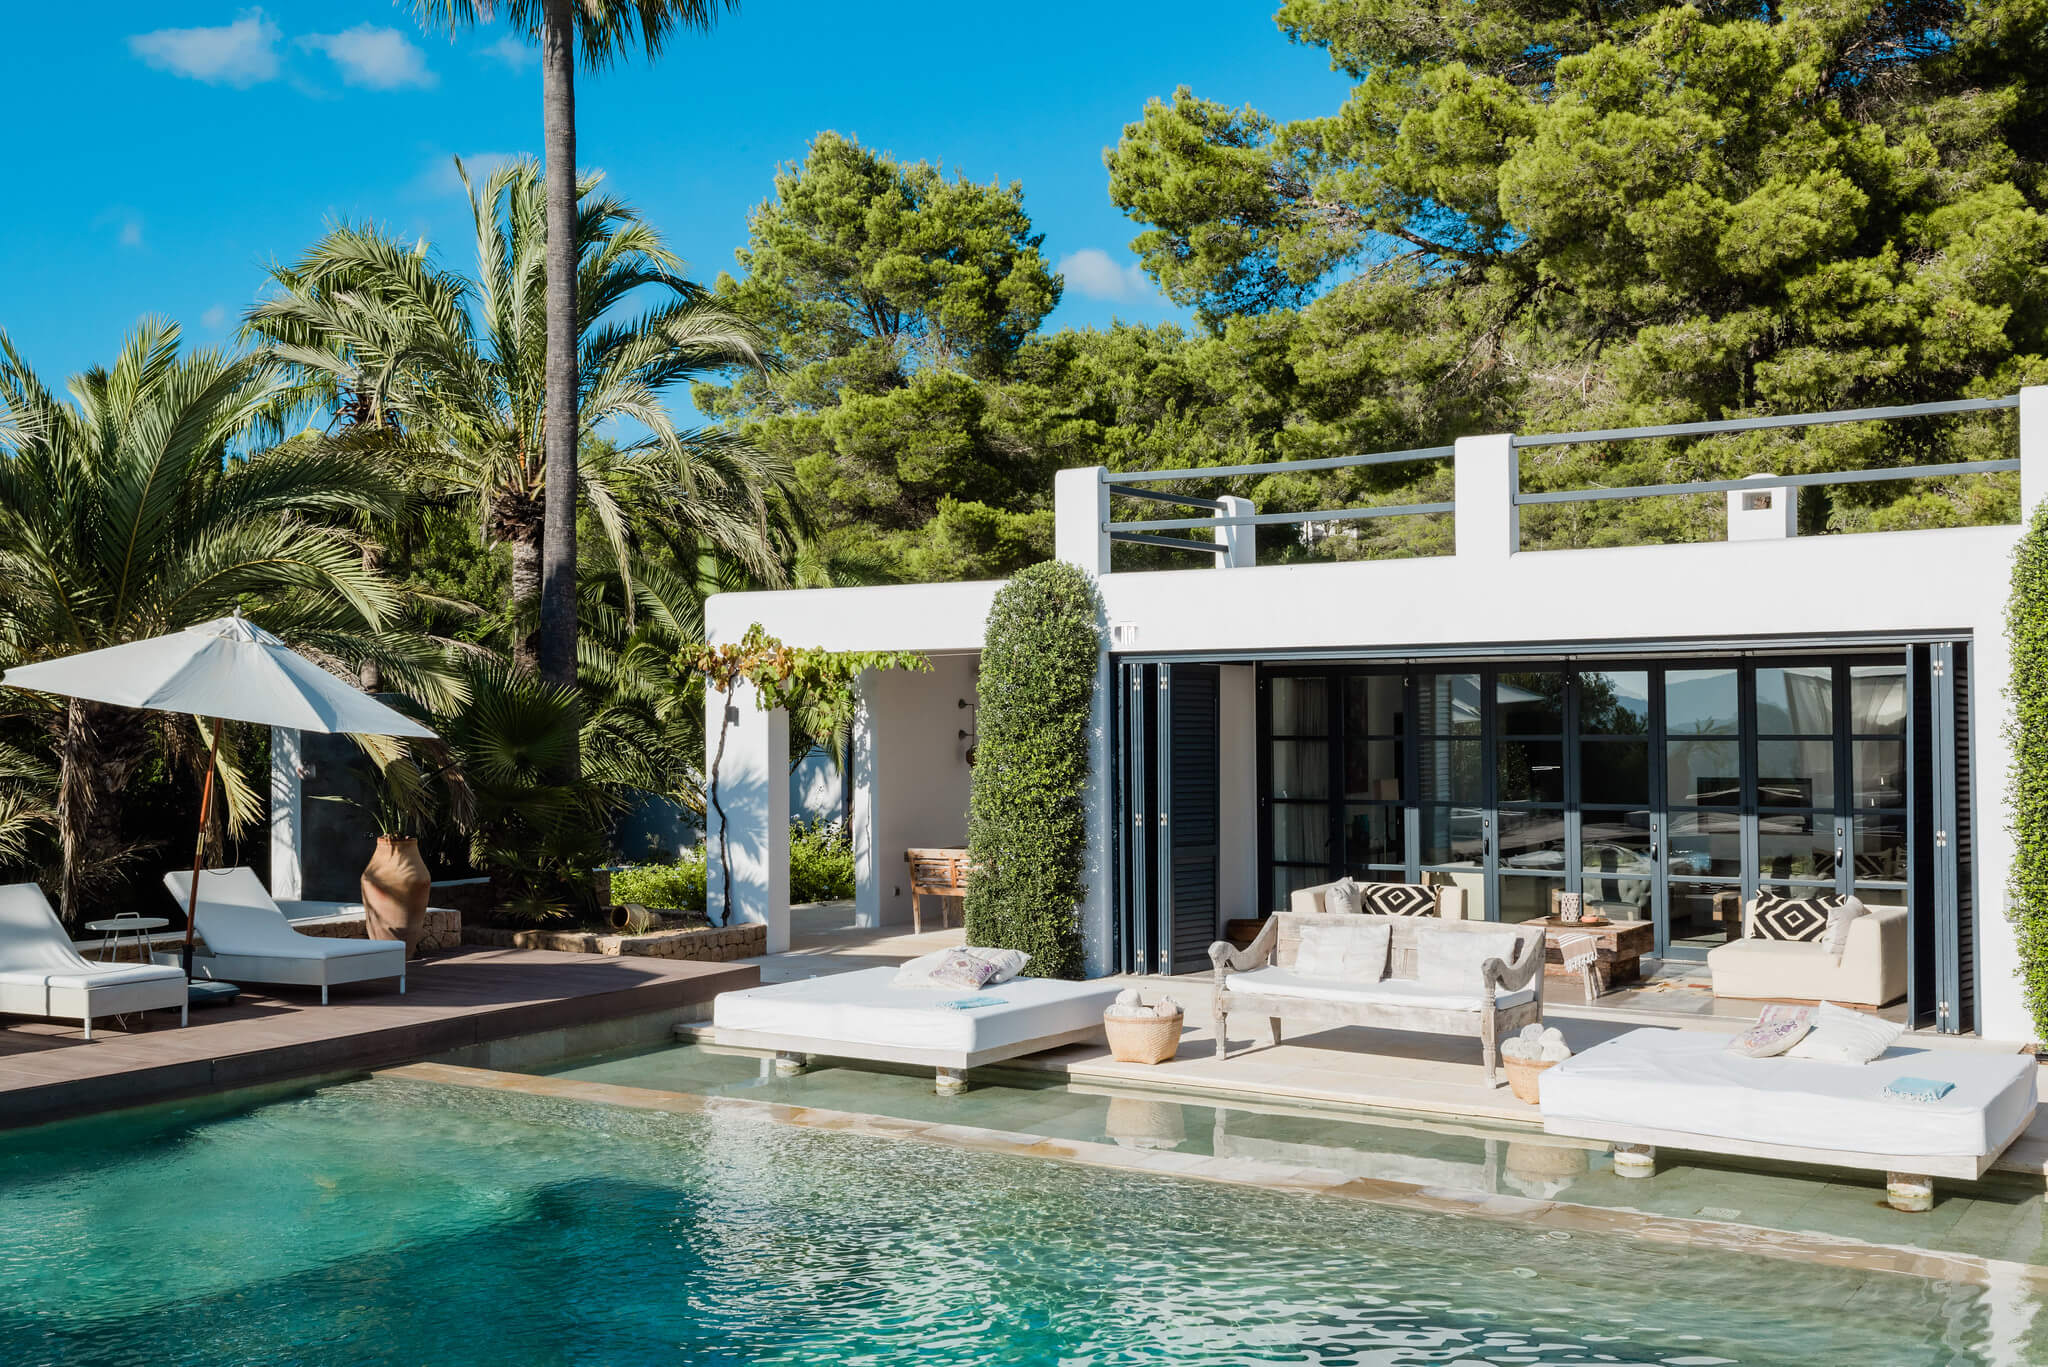 https://www.white-ibiza.com/wp-content/uploads/2020/05/white-ibiza-villas-casa-amalia-exterior-pool2.jpg